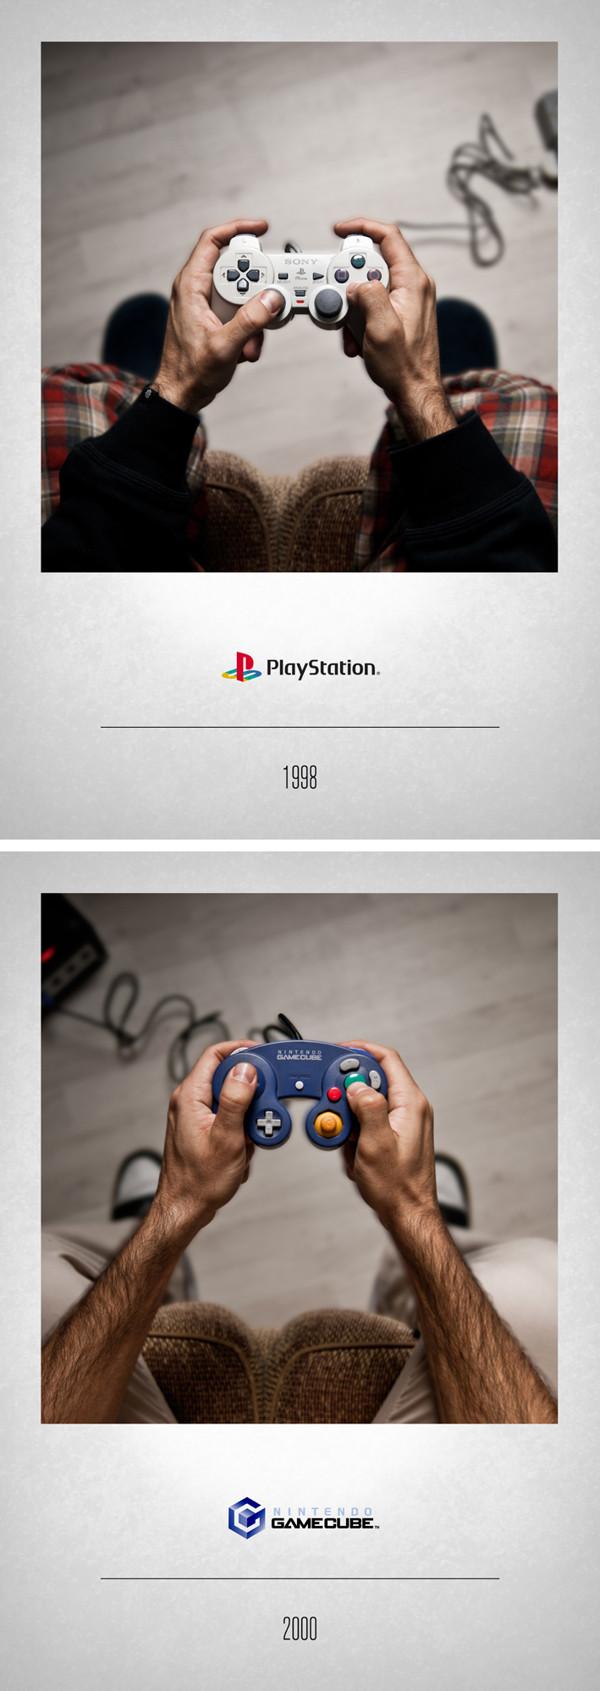 Playstation 1998 – Nintendo GameCube 2000